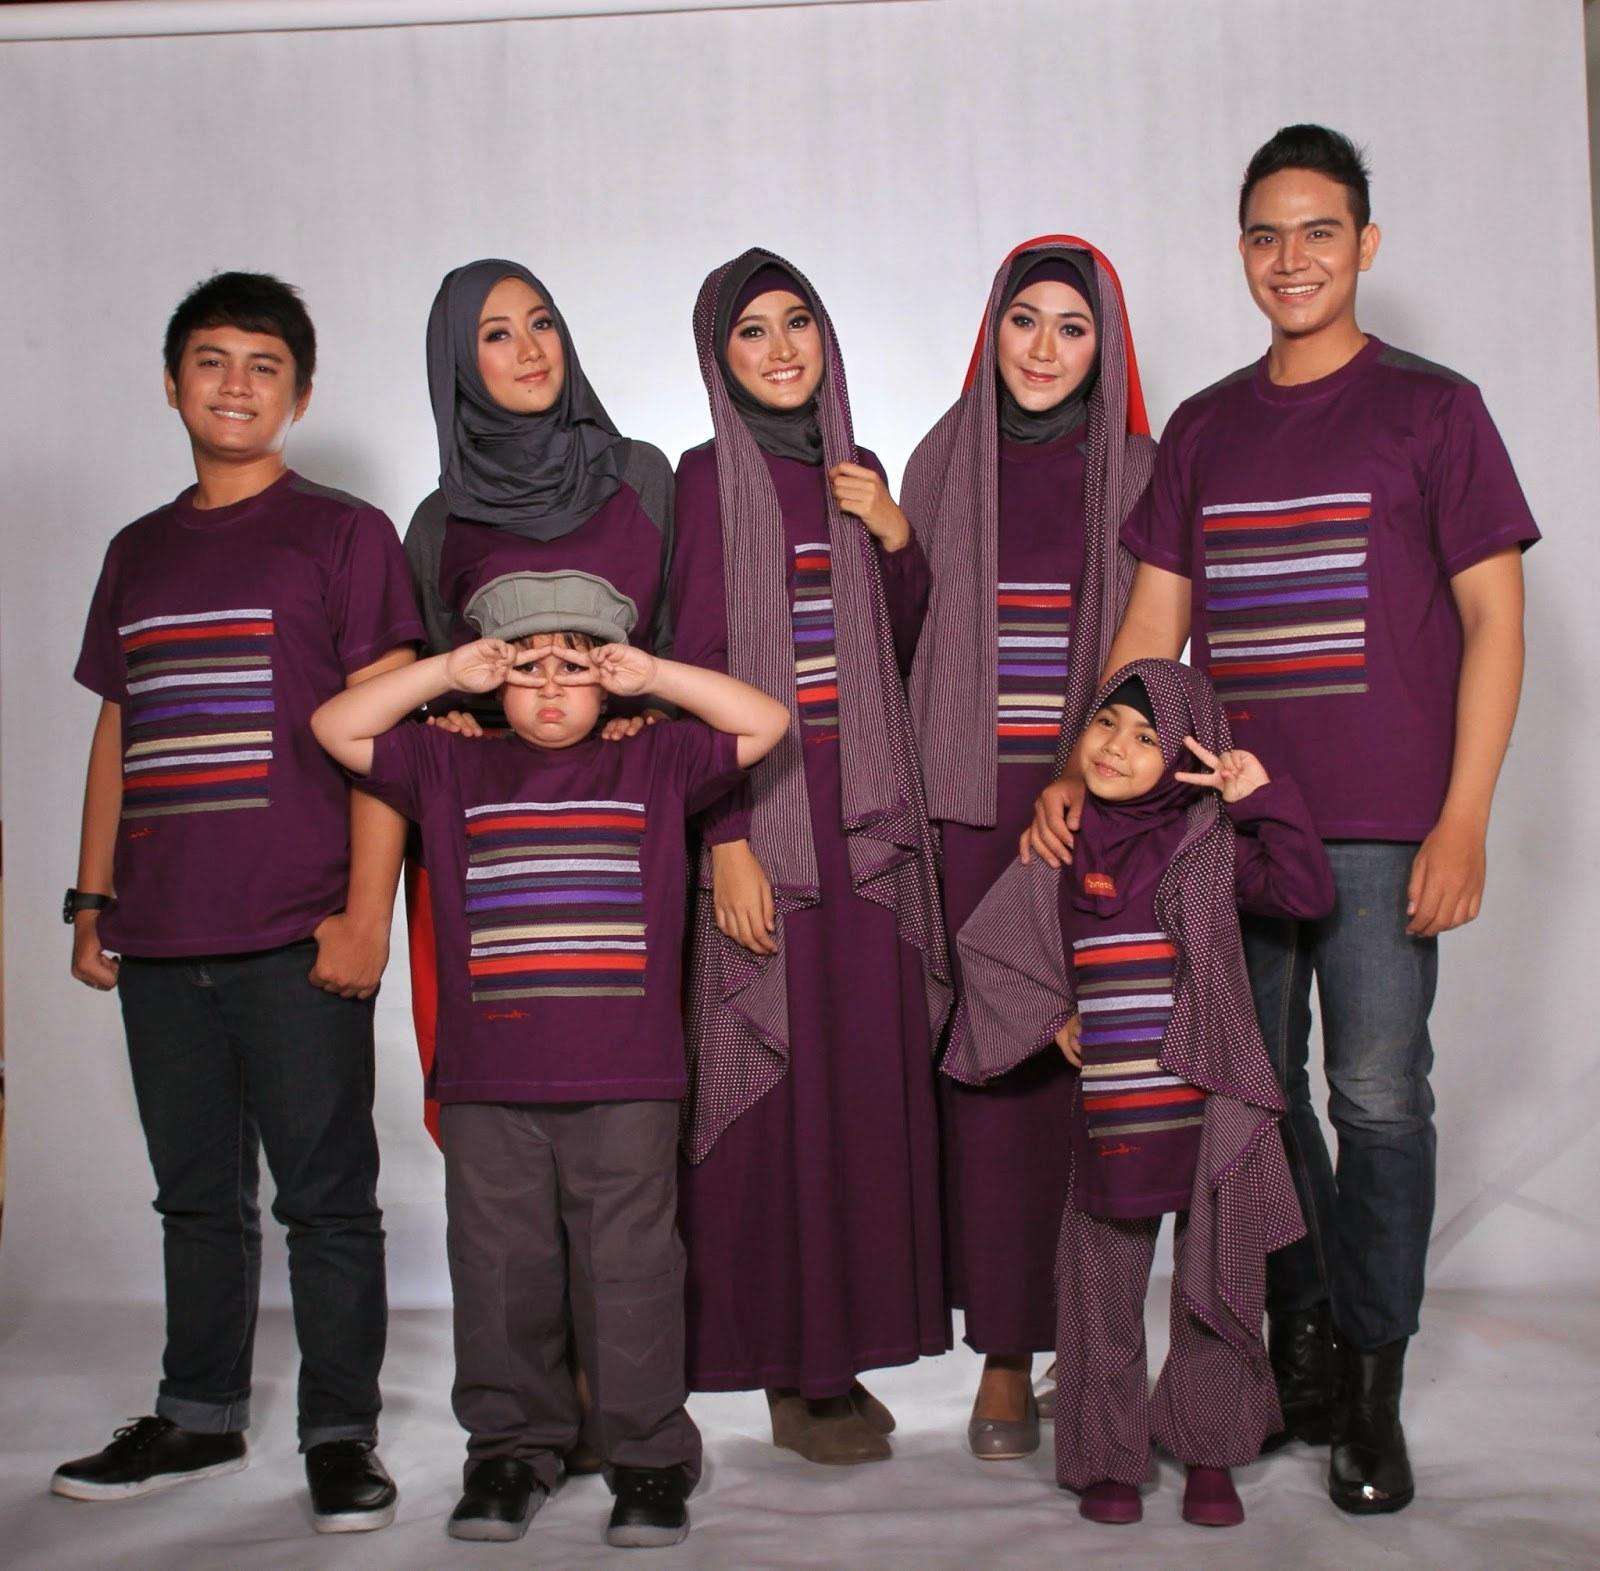 Design Trend Baju Lebaran Anak Perempuan 2018 Dddy Model Baju Keluarga Untuk Hari Raya Lebaran 2018